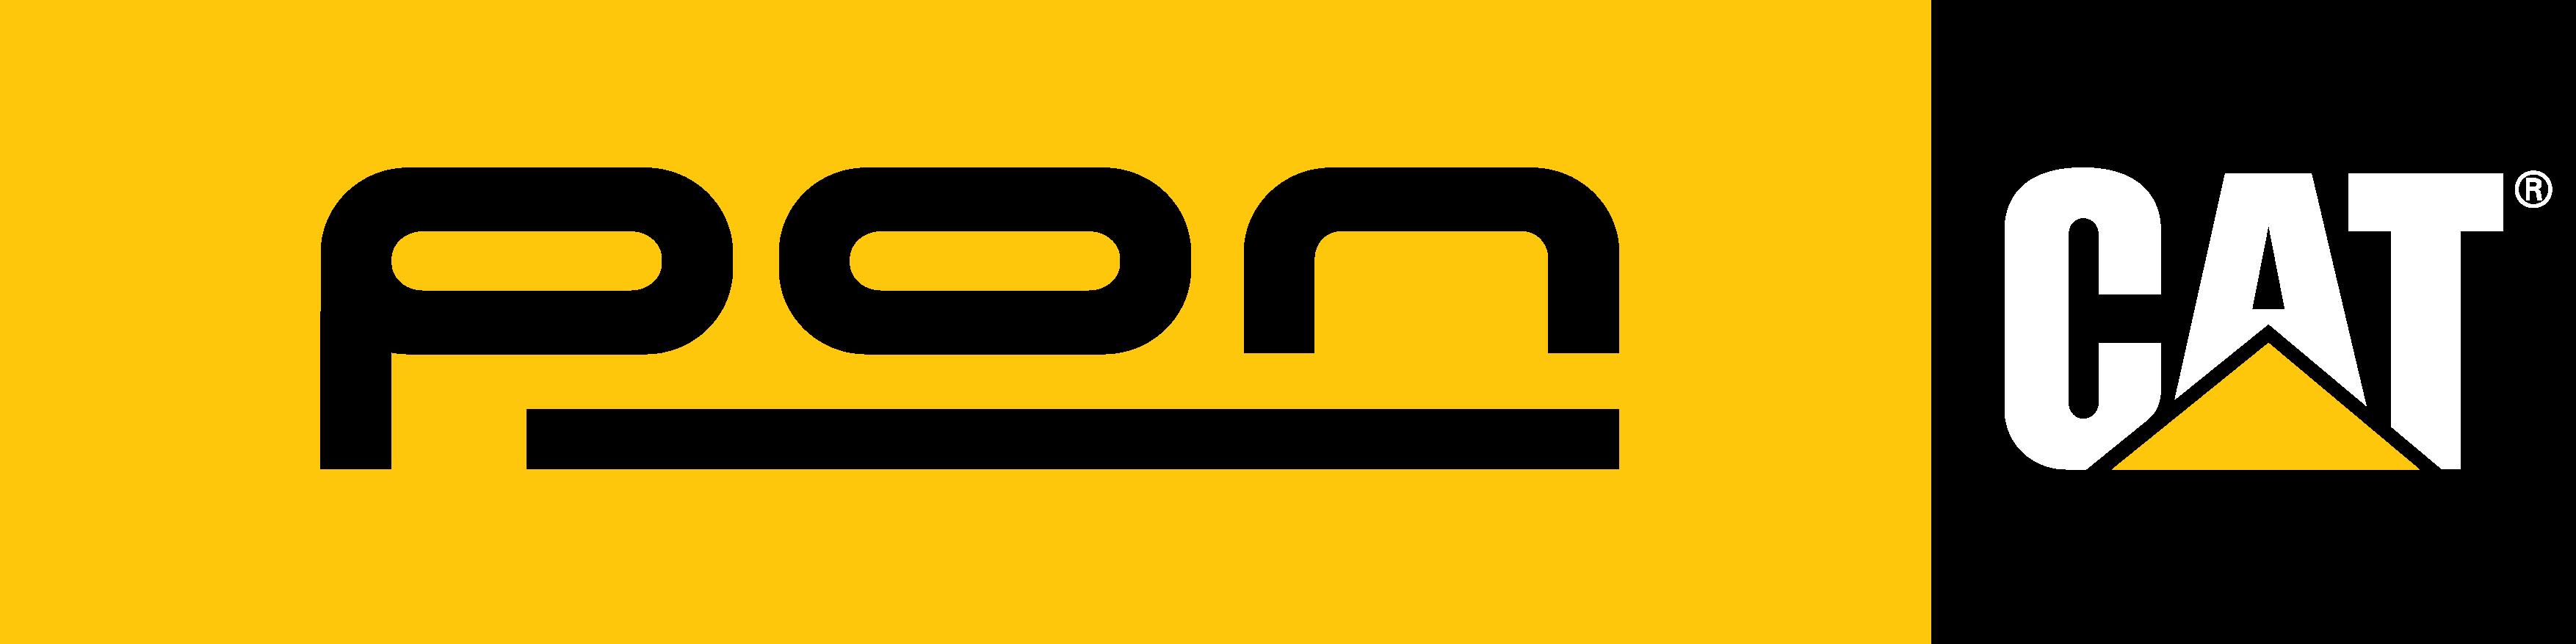 Pon-Power-logo